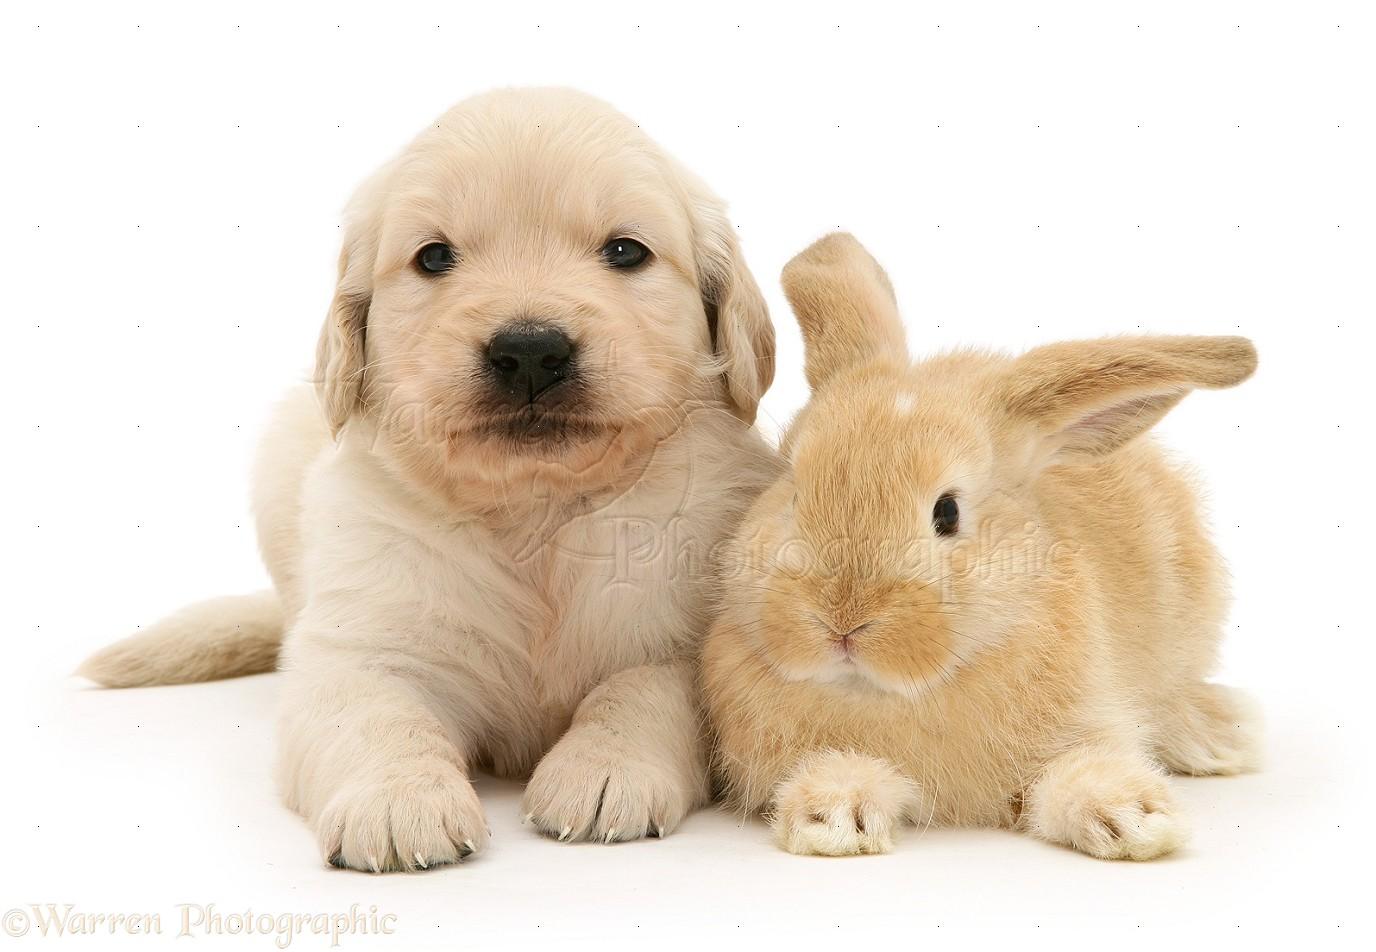 Pics Photos - Baby Golden Retriever Puppies On Golden Retriever ... Golden Retriever And Baby